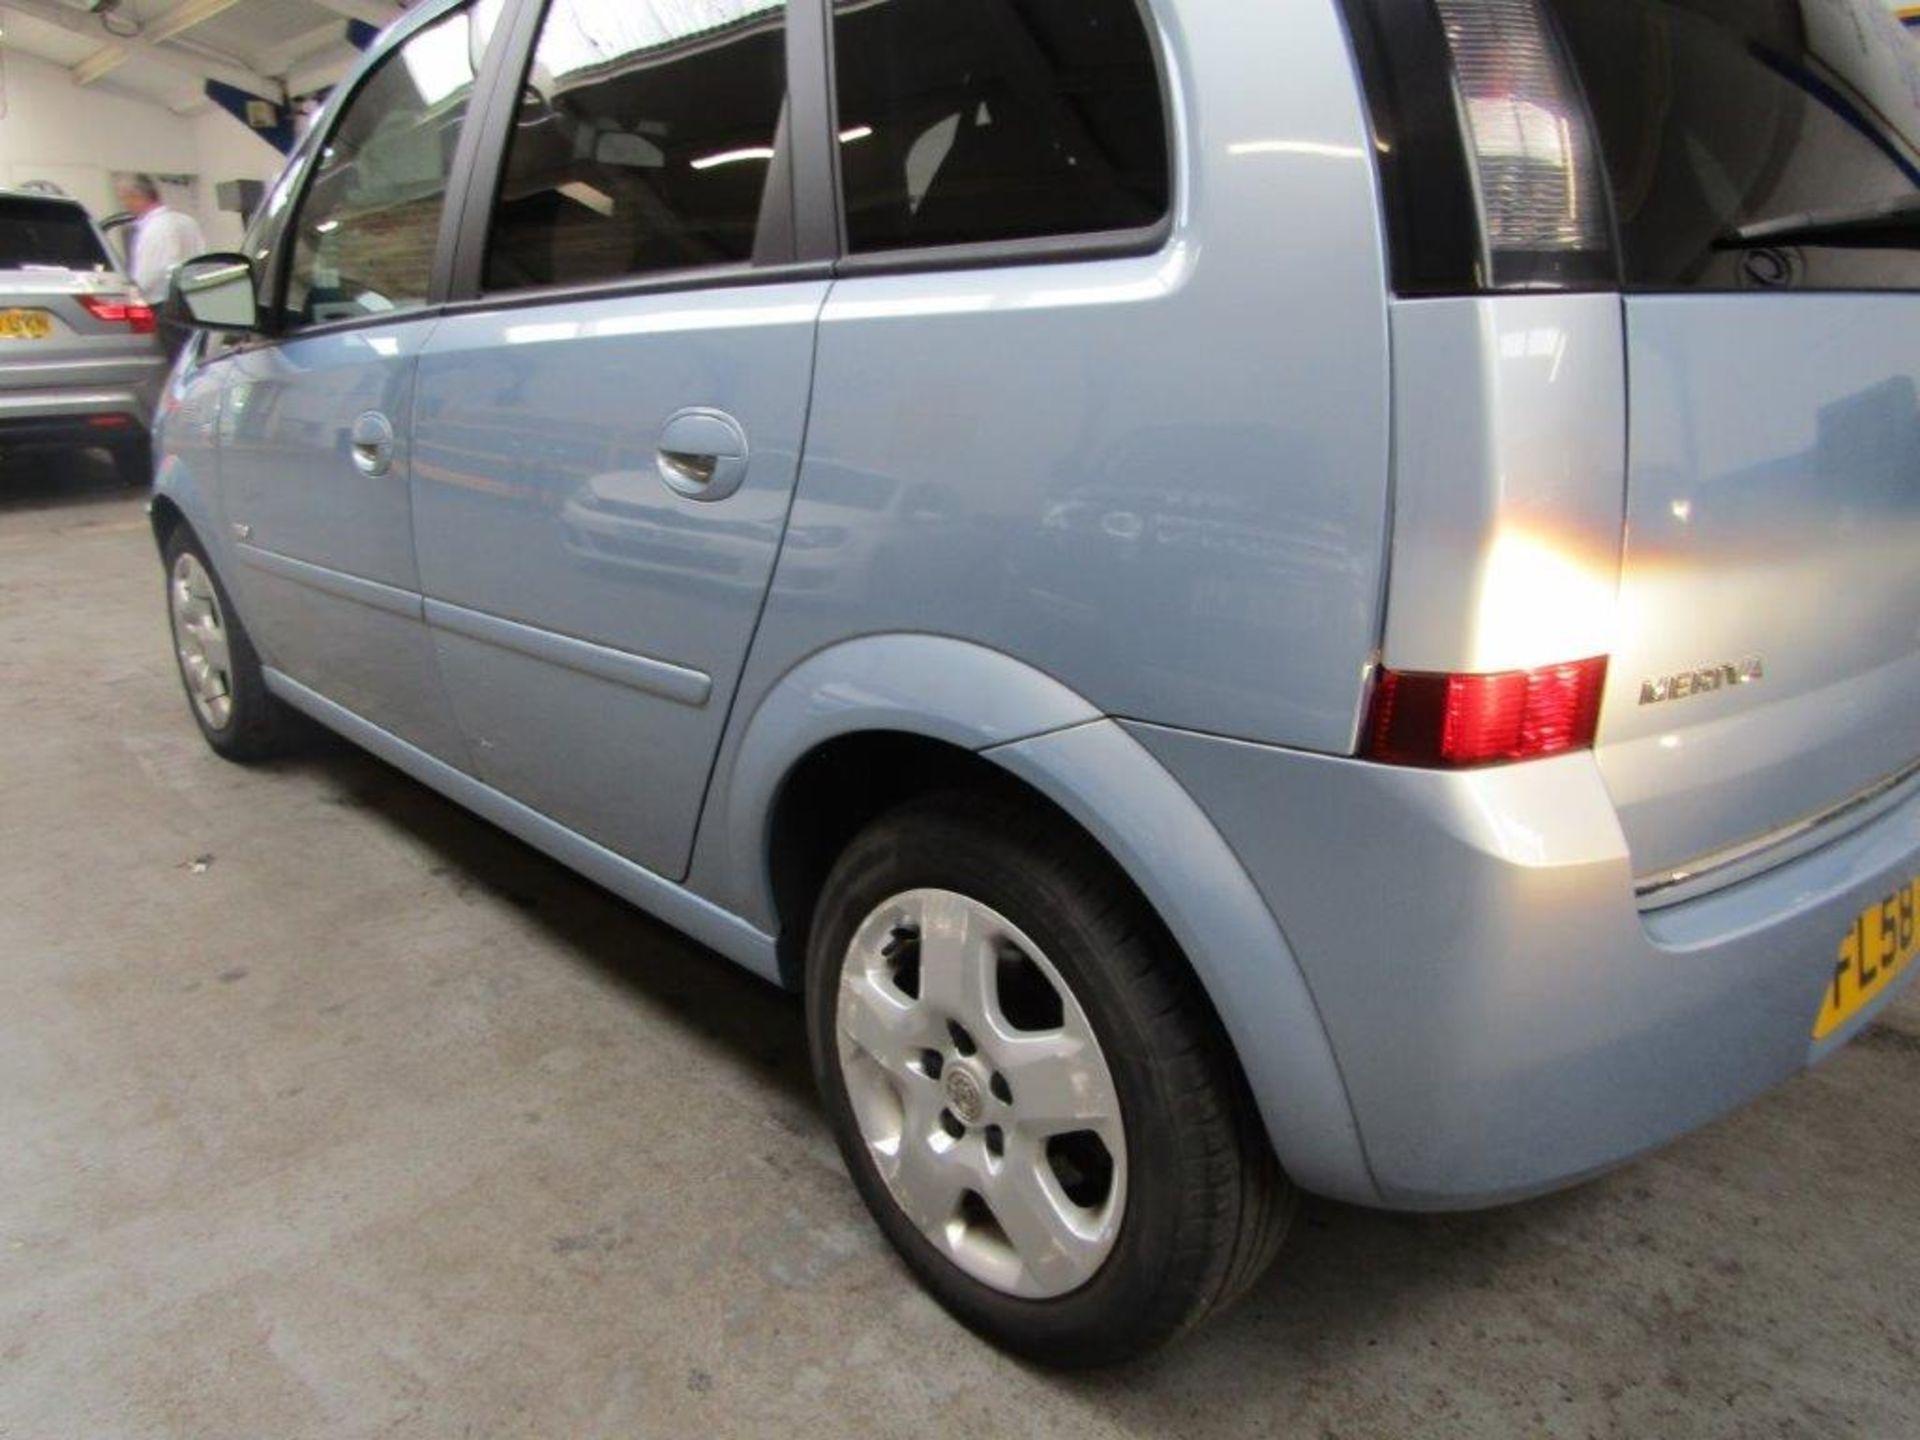 58 08 Vauxhall Meriva Design - Image 20 of 25